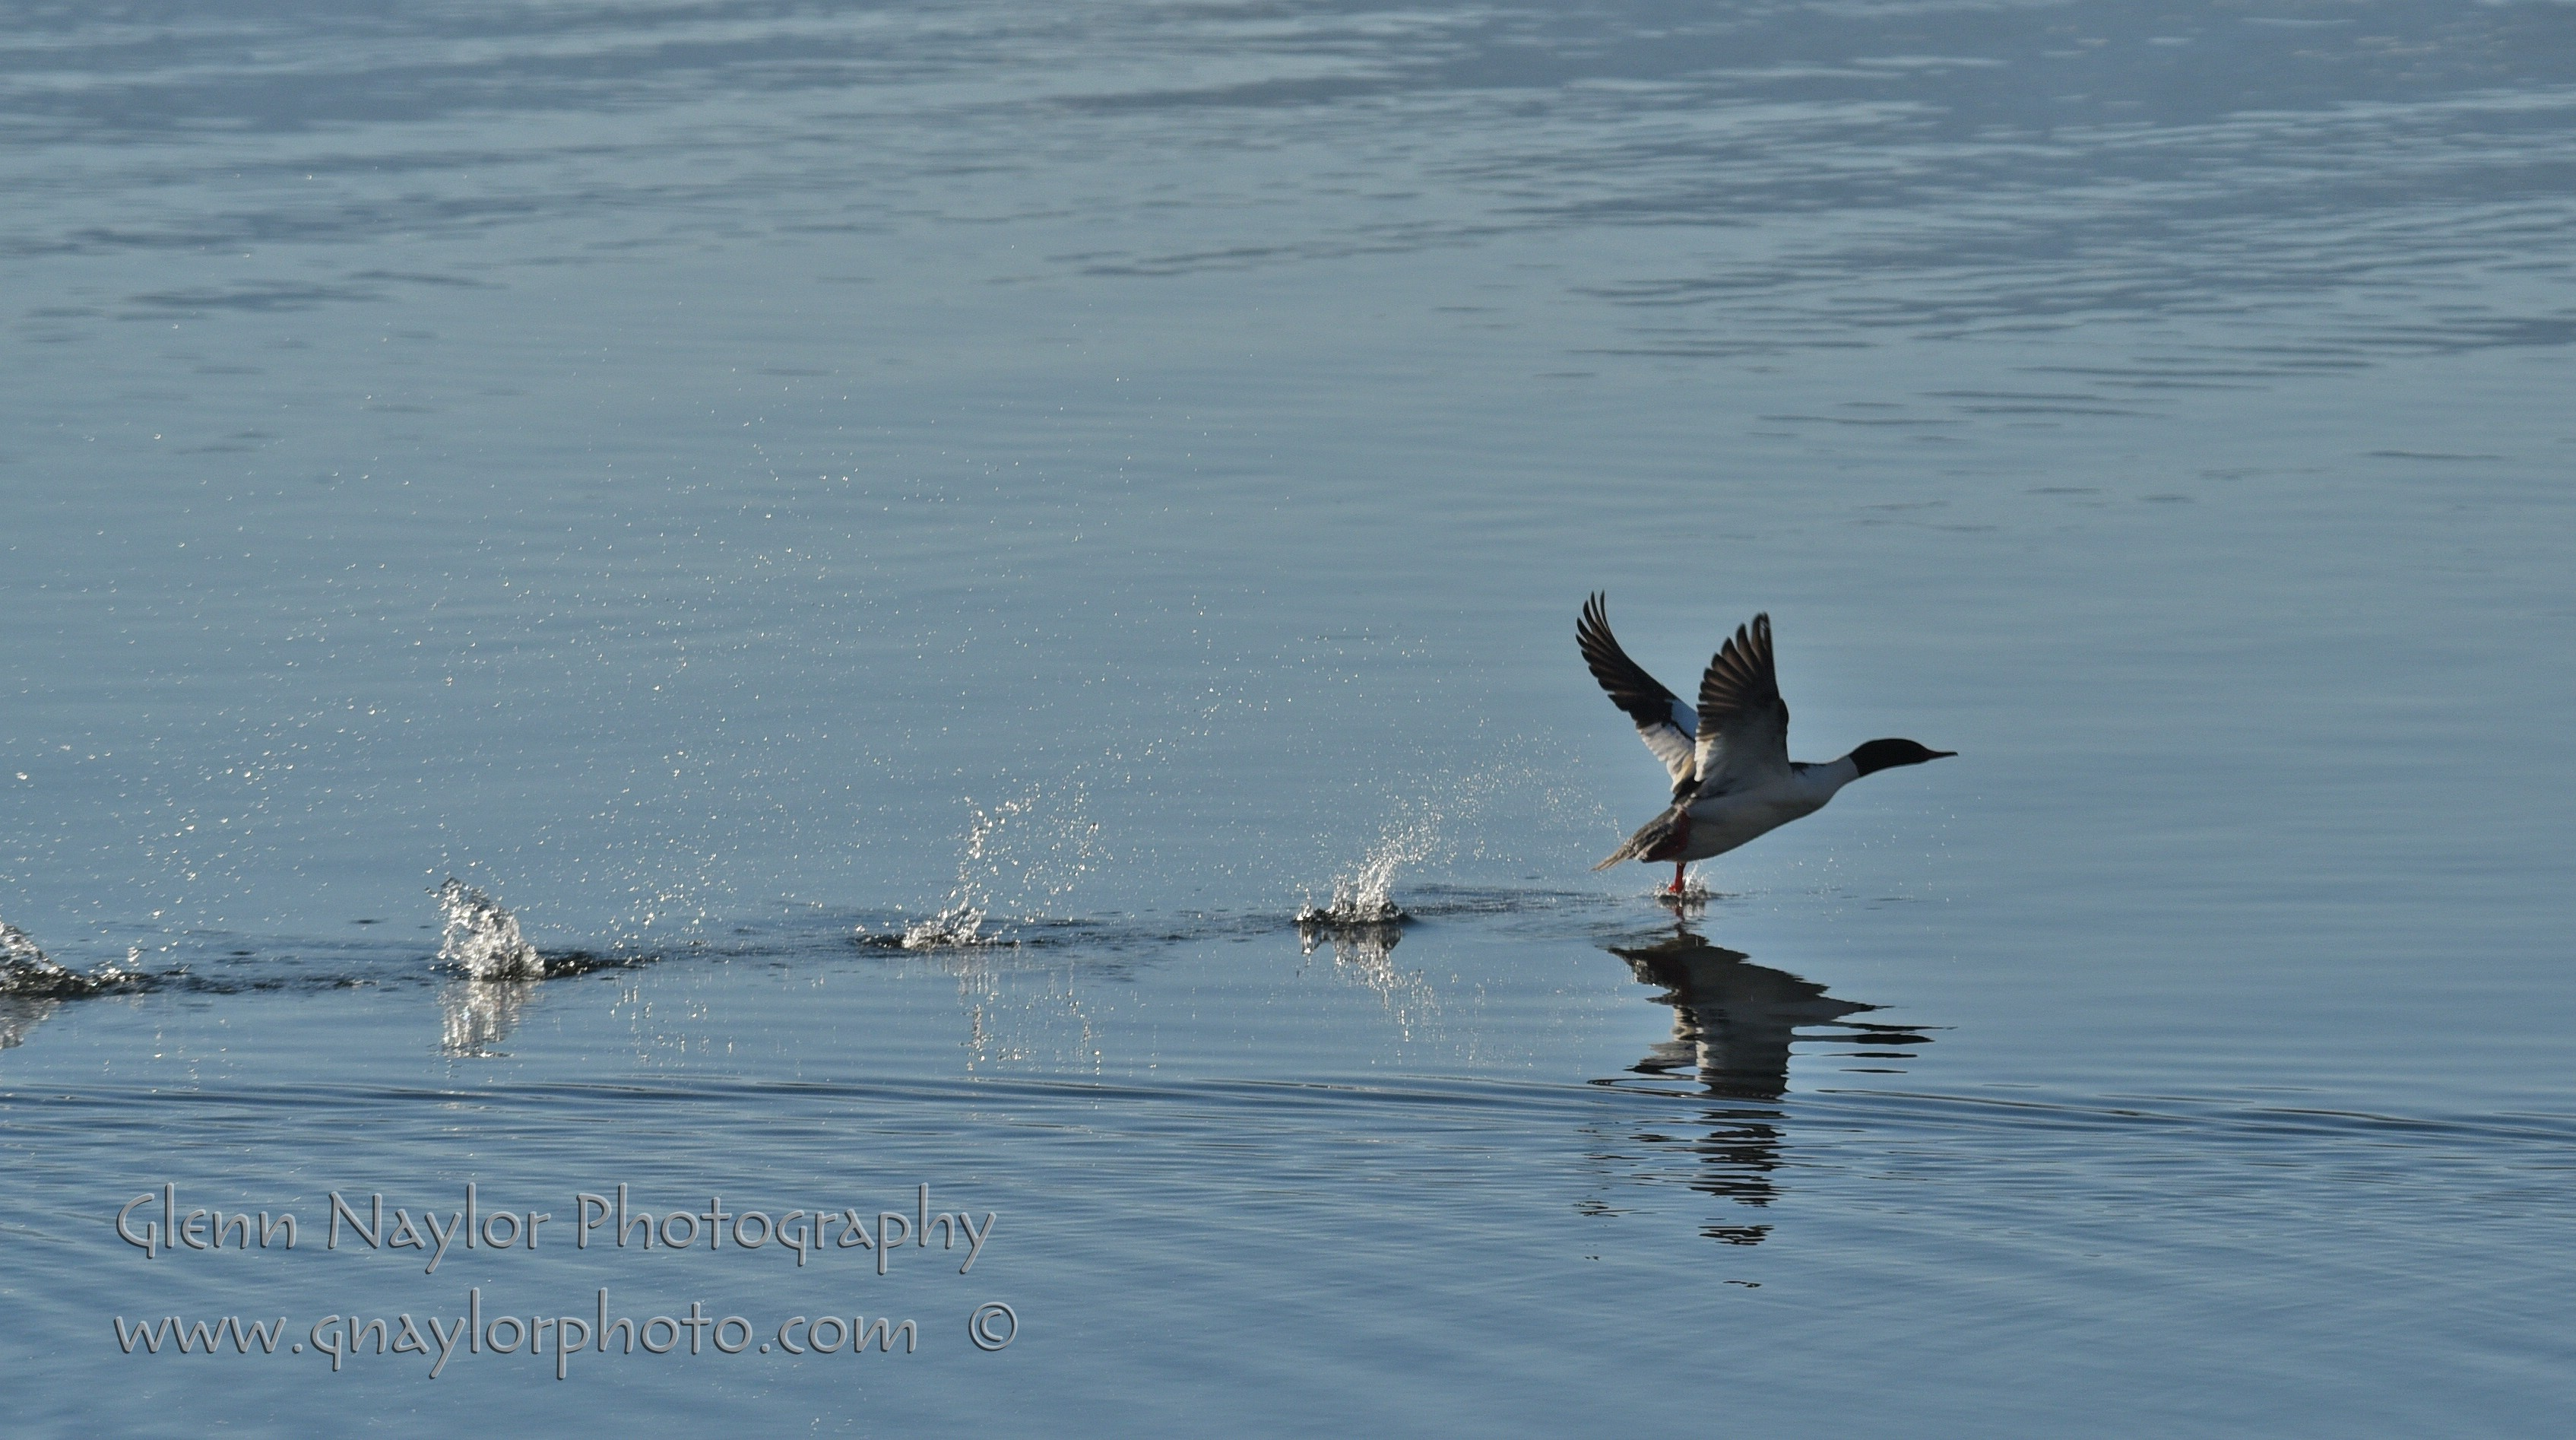 Merganser take off, Comox Bay